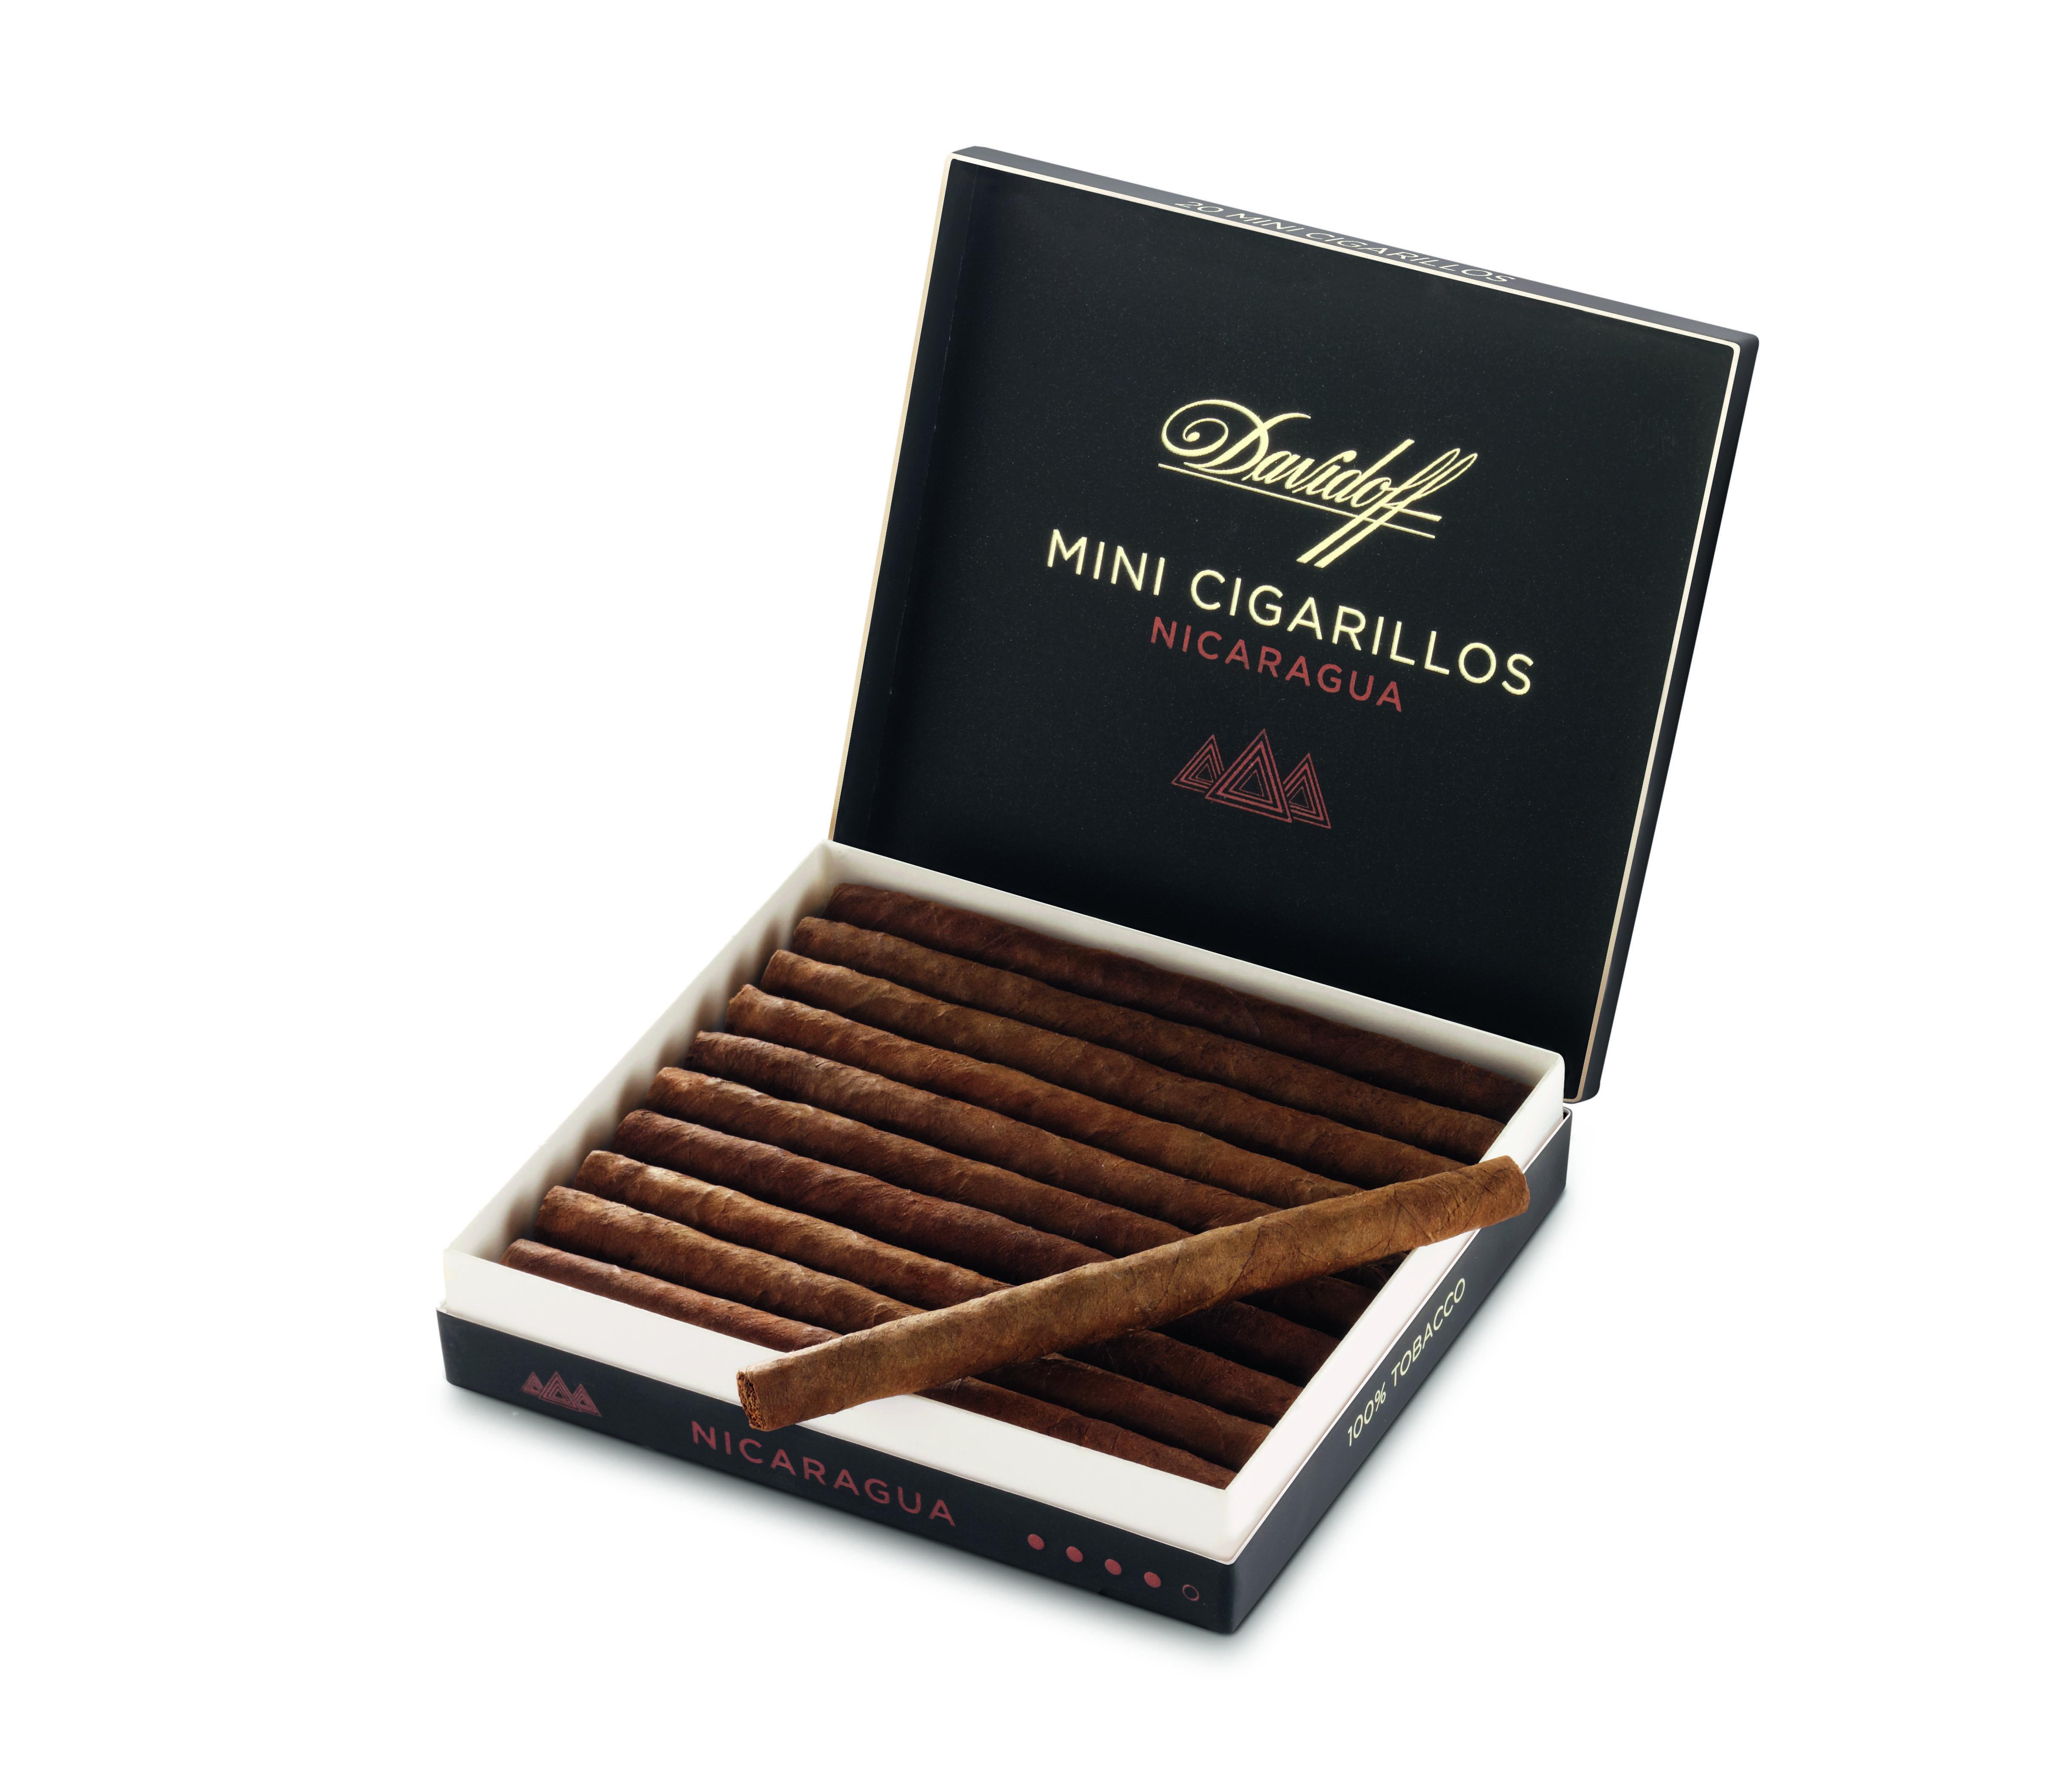 Davidoff Mini Cigarillos